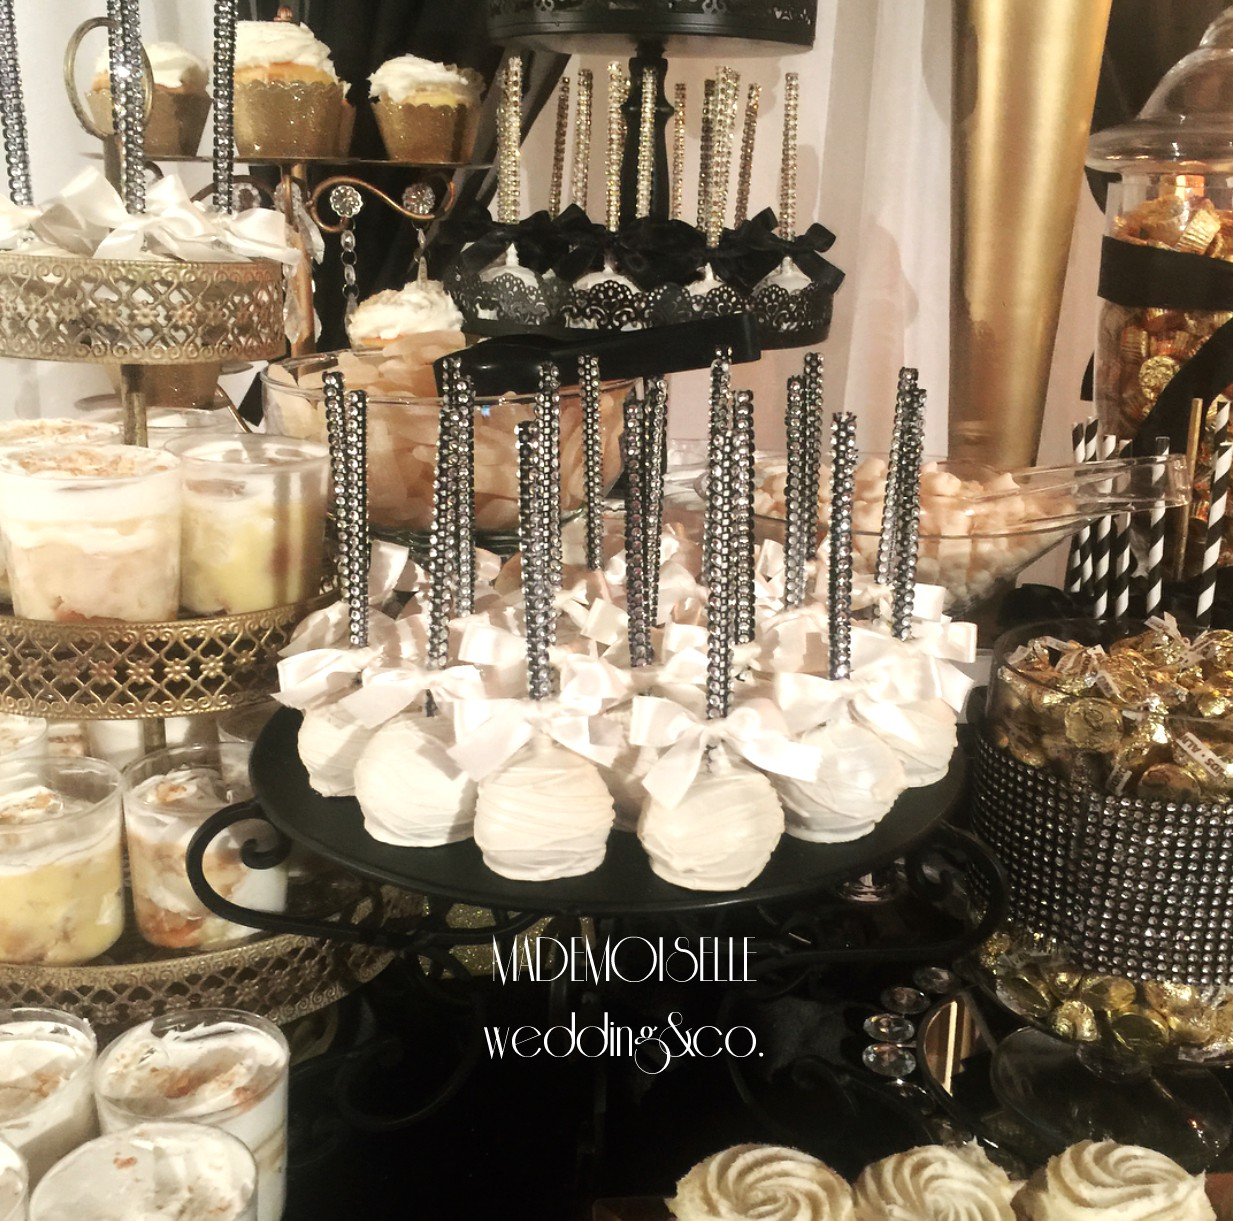 Slatki sto-dekoracija za slatki sto-dekoracija slatkog stola-kolaci-cupecakes-crno zlatna dekoracija slatkog stola-muffins-cakepops-dekoracija krstenja-slatki sto nis